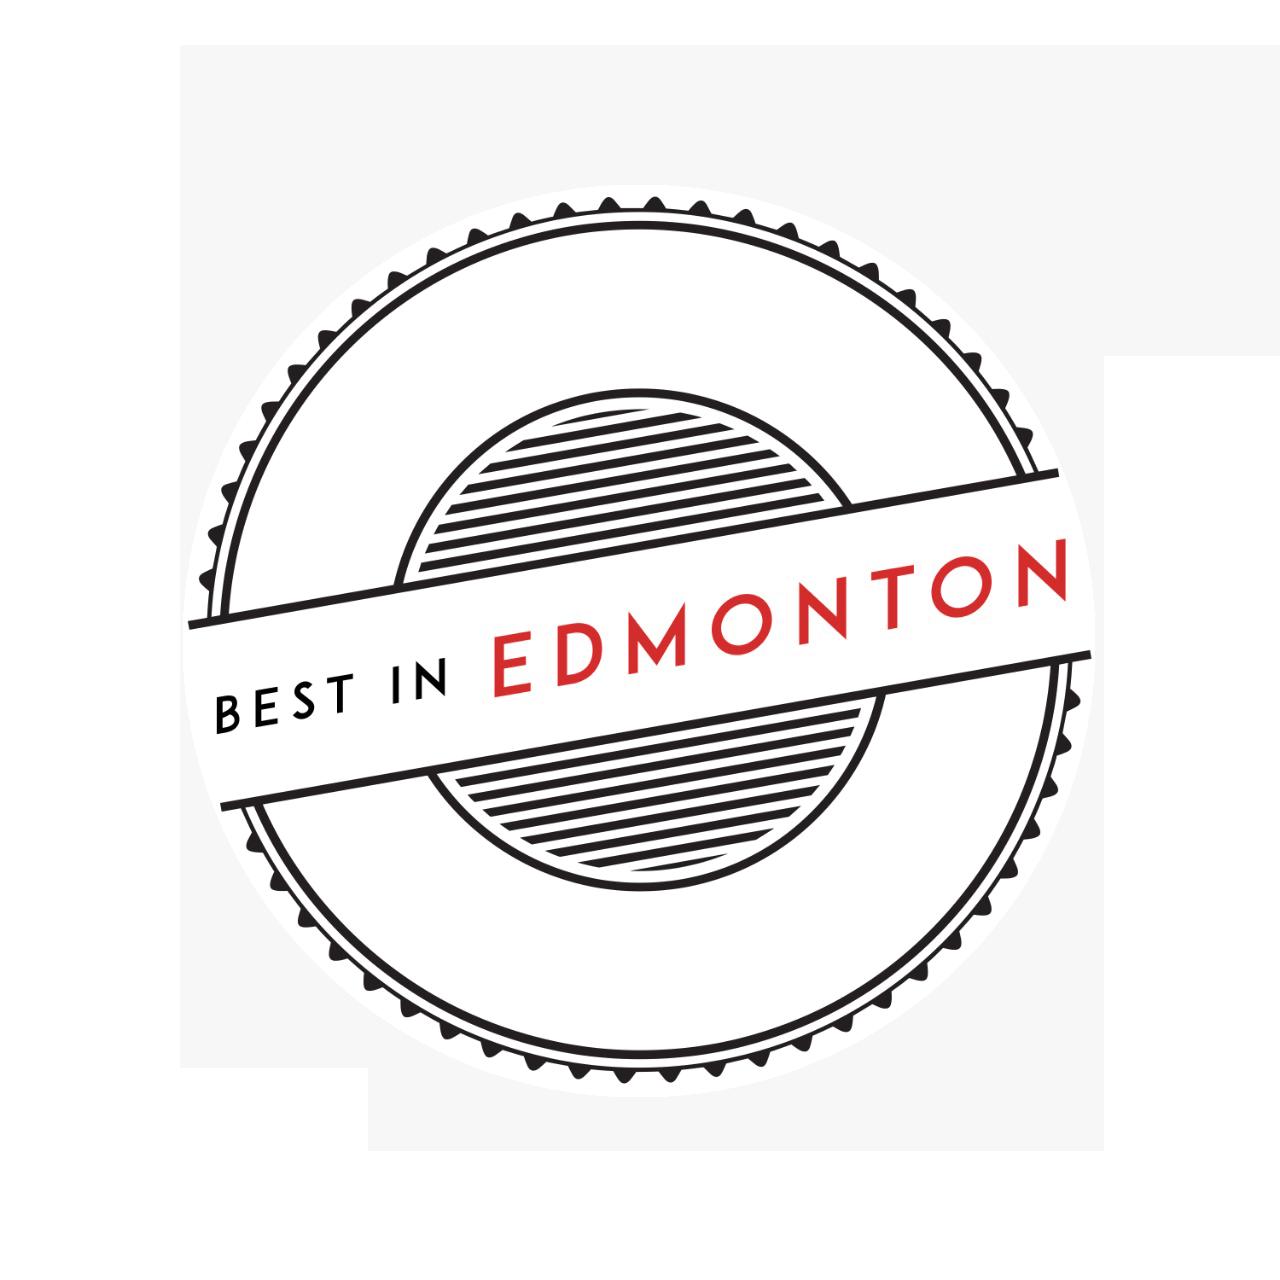 https://www.bestinedmonton.com/best-real-estate-agents-edmonton/